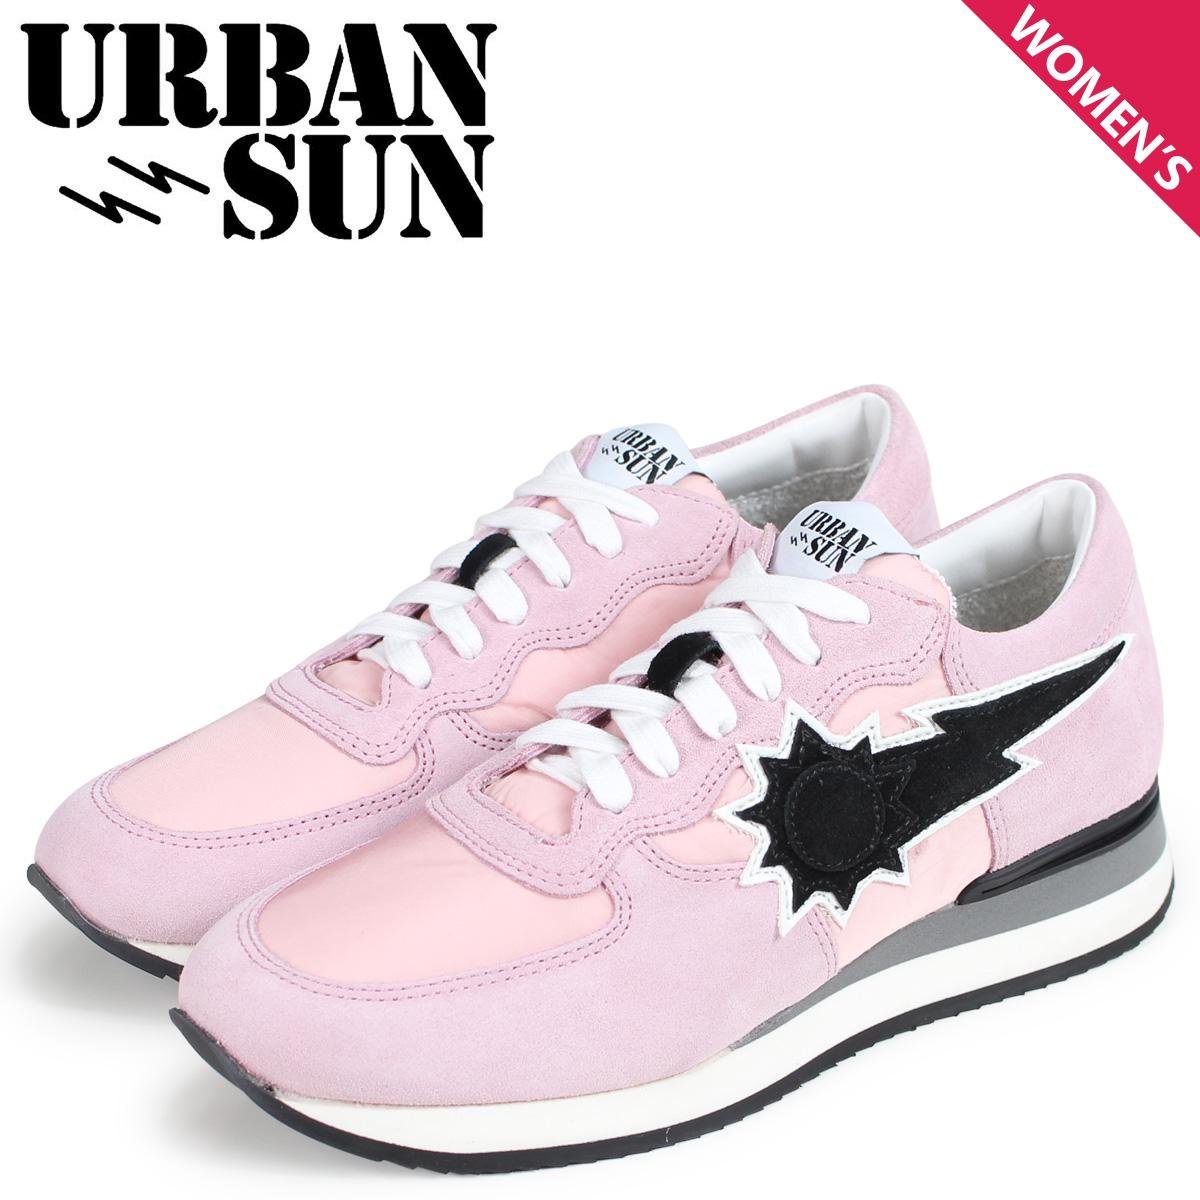 URBAN SUN アーバンサン ドリス スニーカー レディース DORIS ピンク